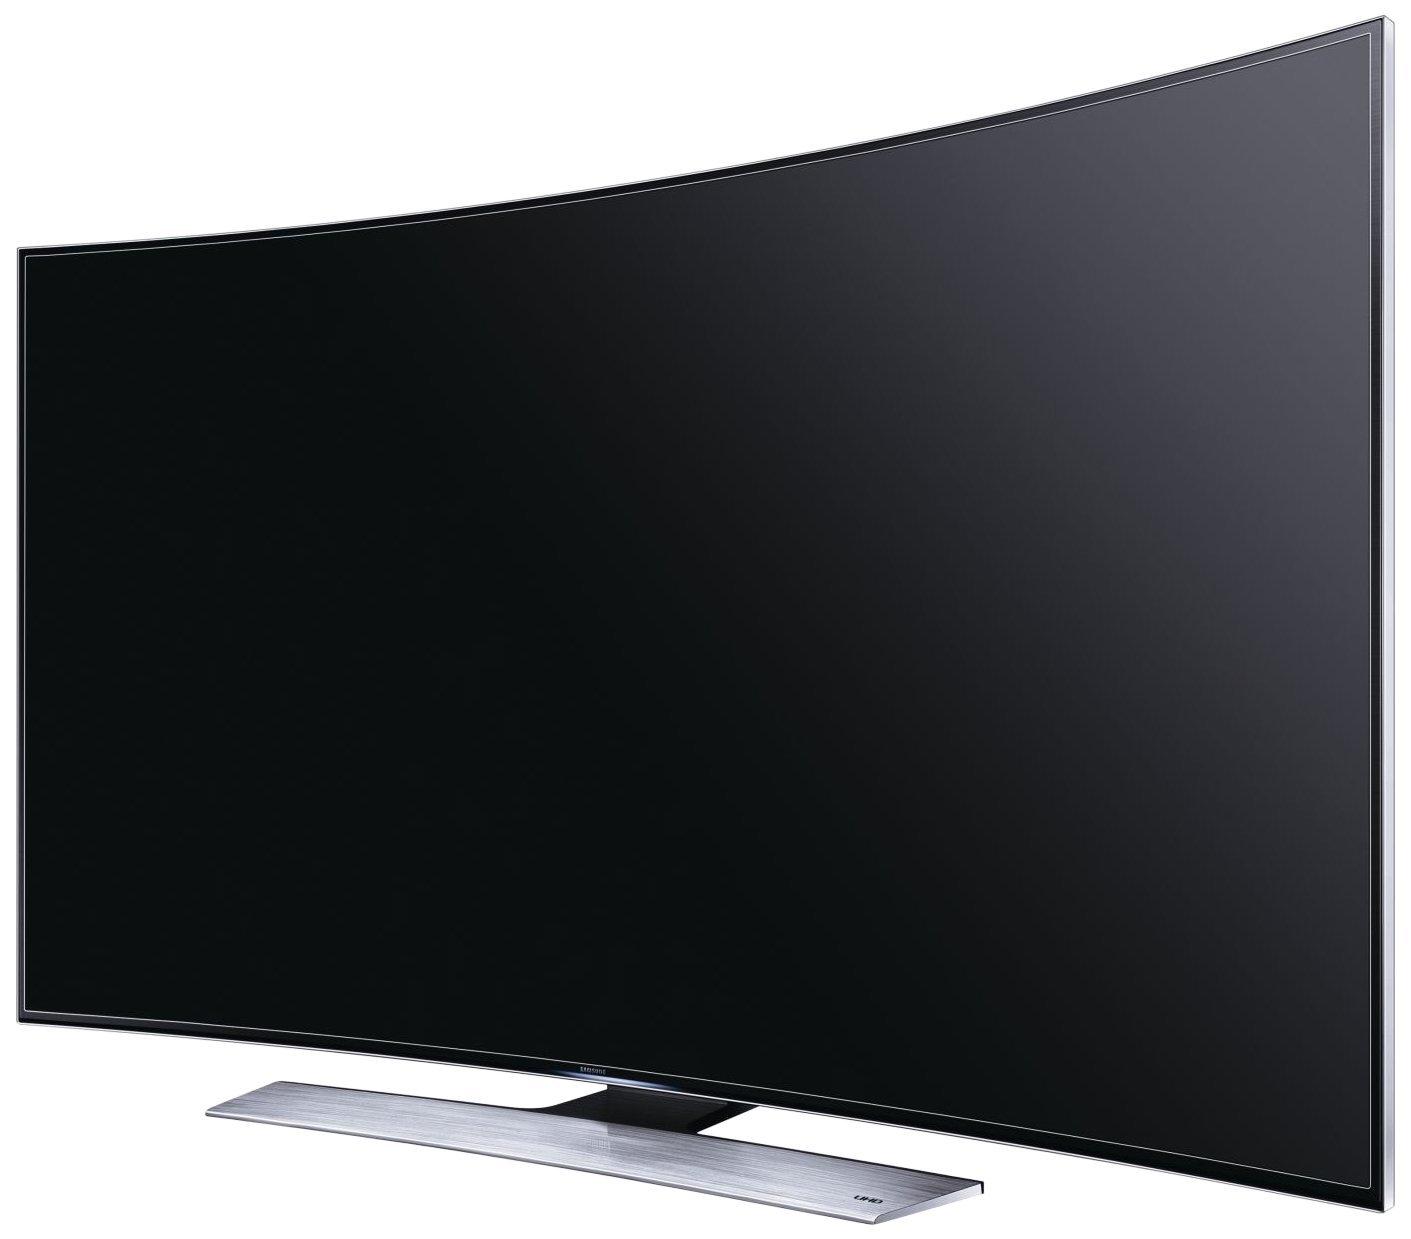 testbericht zum curved tv samsung ue65hu8500. Black Bedroom Furniture Sets. Home Design Ideas